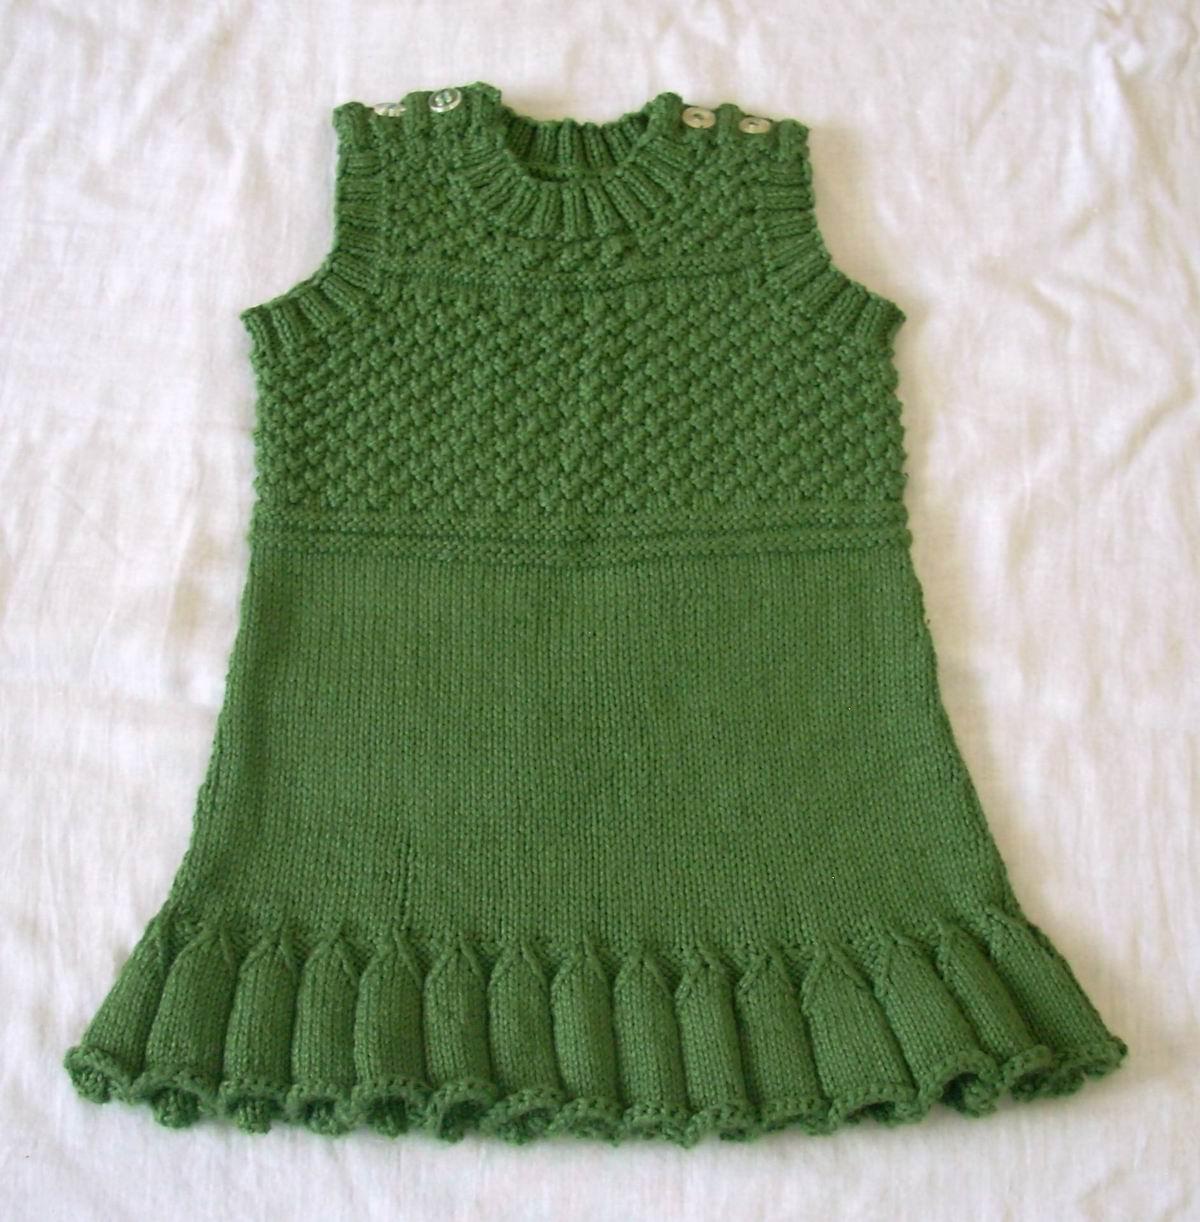 457bef755 Umme Yusuf  DROPS Baby Dress   Vest